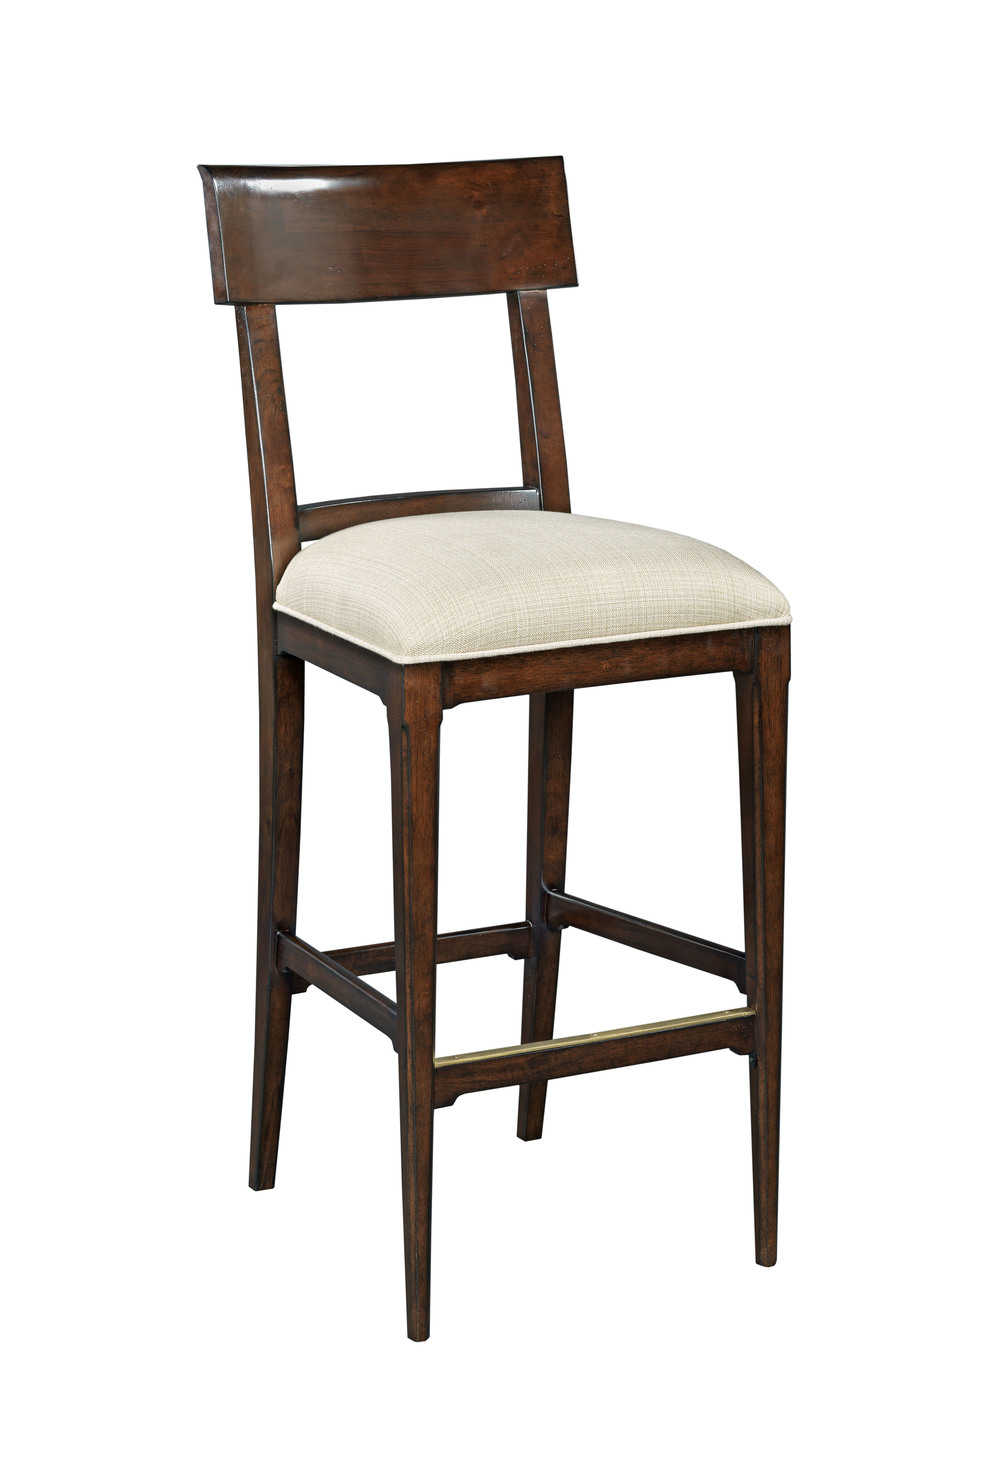 Woodbridge Furniture Company - Bar Stool